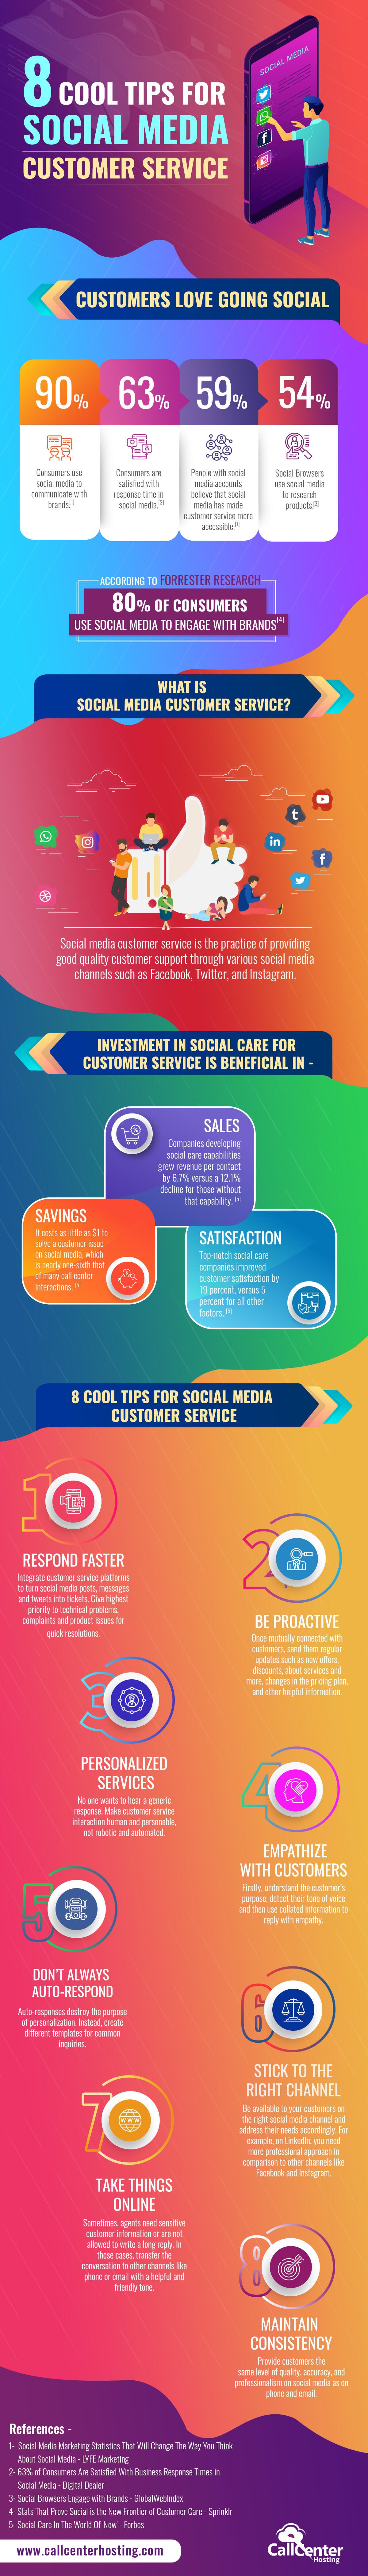 infographic customer service